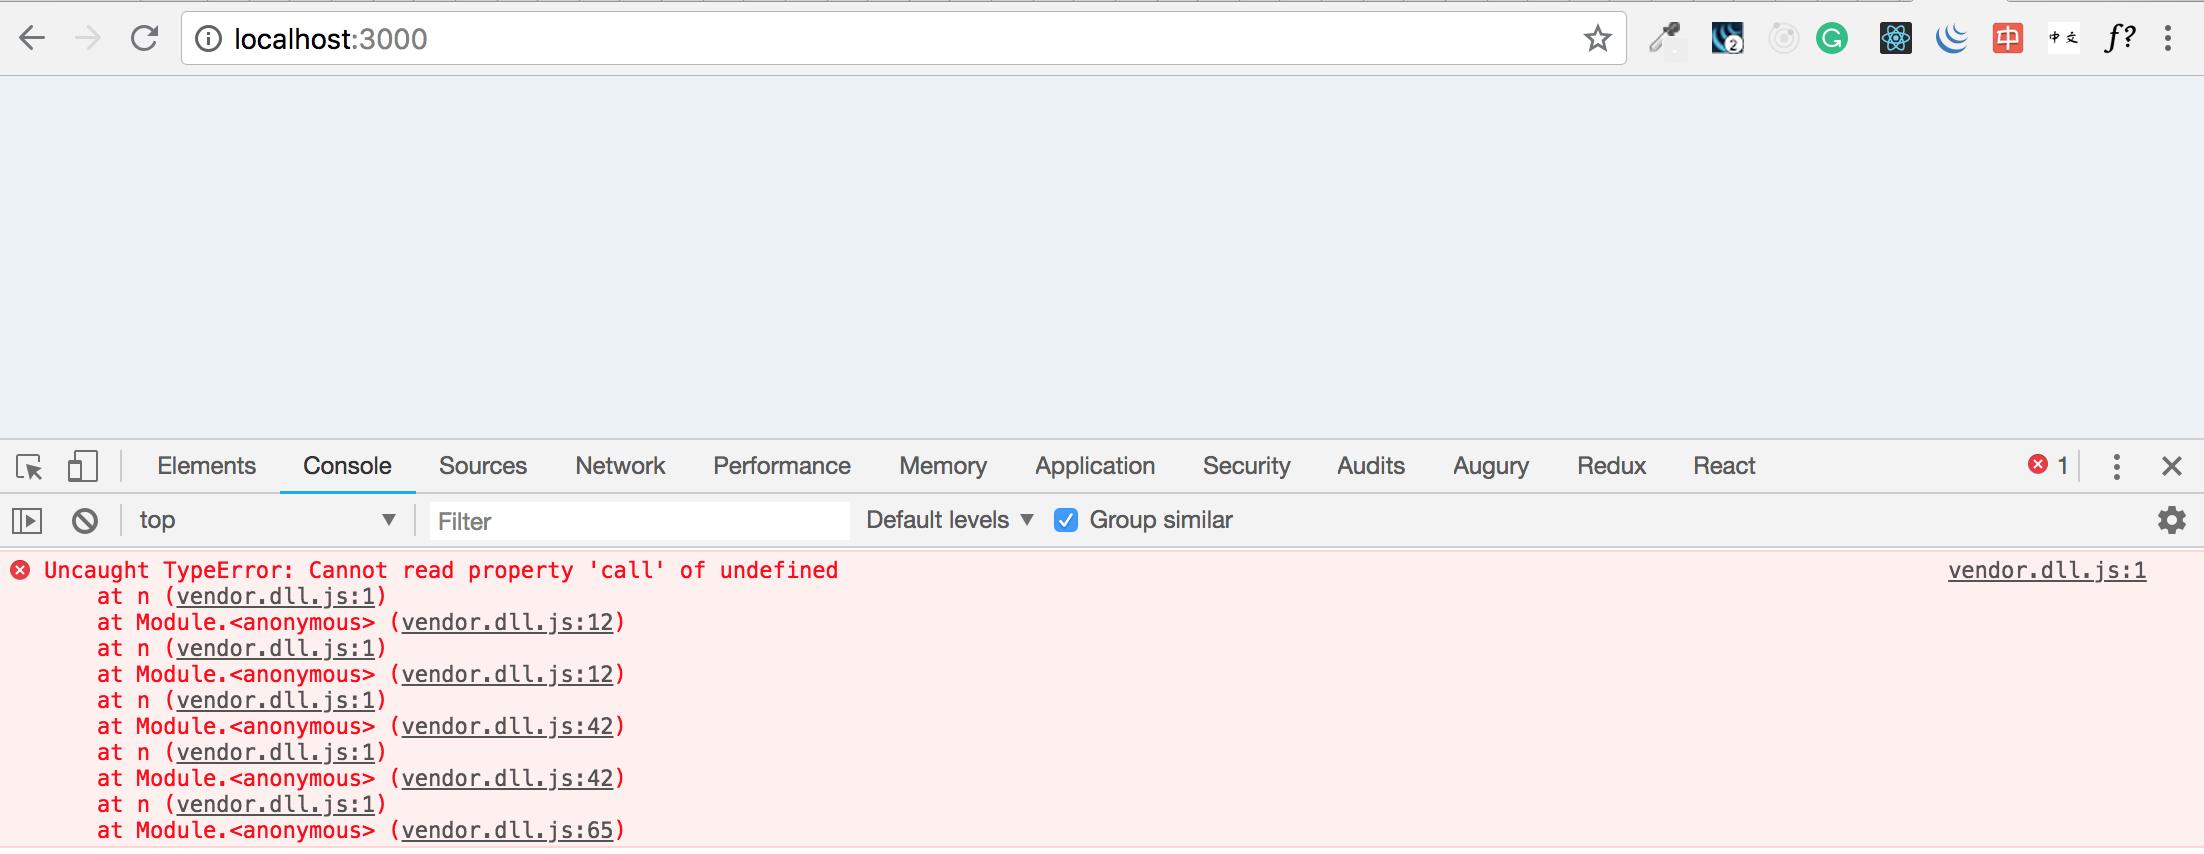 Error deploying on Heroku - FATAL ERROR: CALL_AND_RETRY_LAST